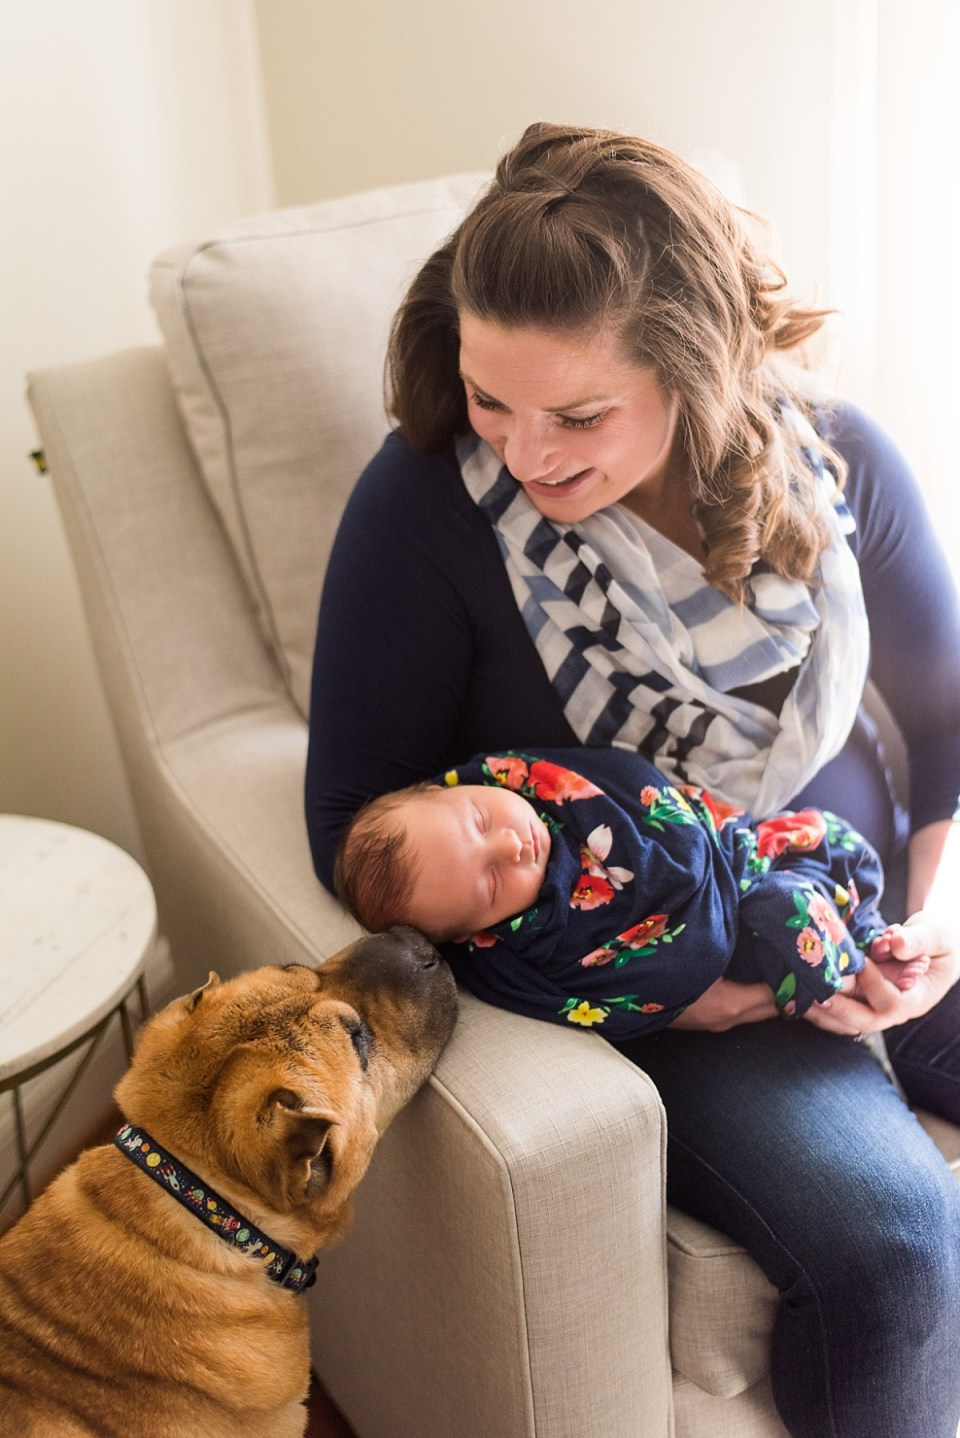 Newborn Girl and her dog - Springfield Newborn Photograph by Erin Tetterton Photography